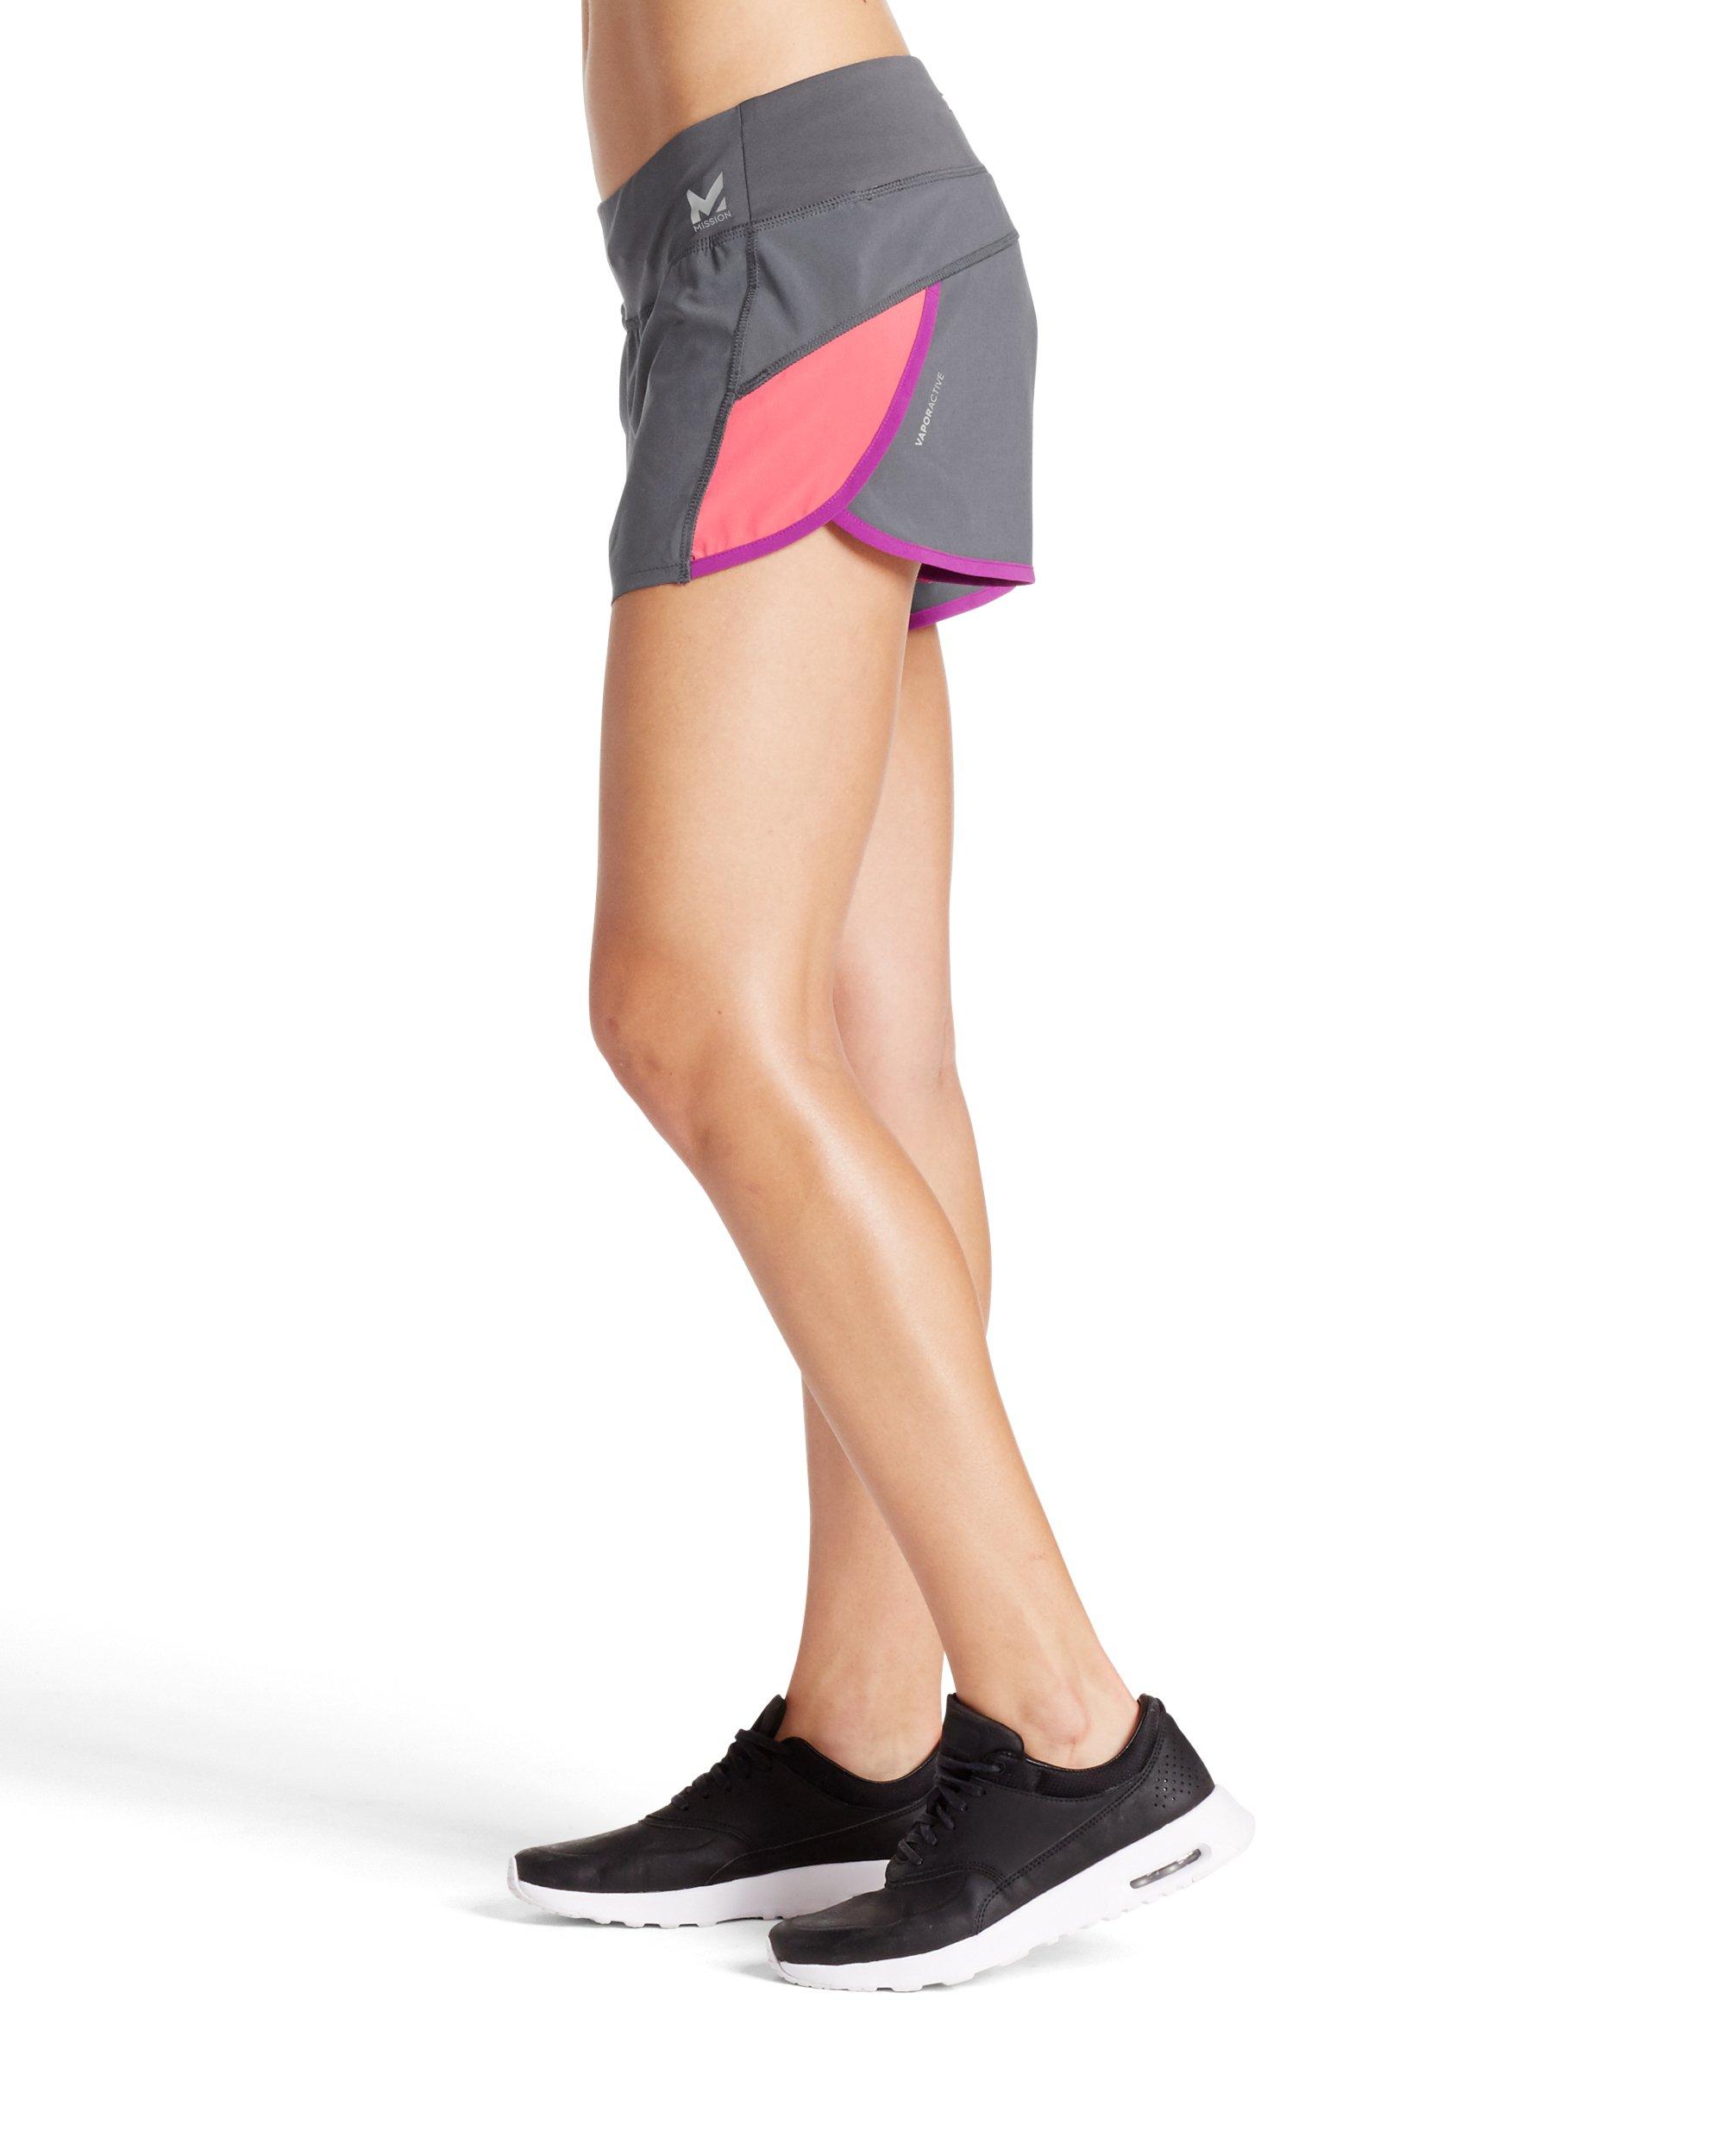 "Mission Women's VaporActive Momentum Running 3"" Shorts, Iron Gate/Calypso Coral, Medium"